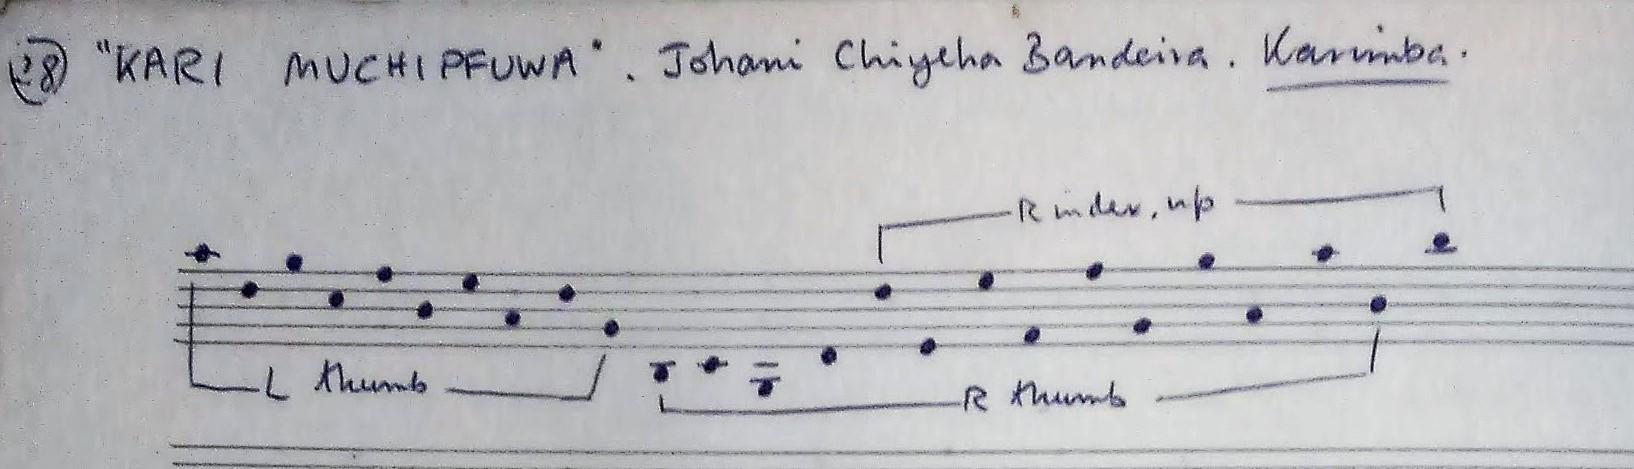 Layout of Johani Chiyeha Bandeira's karimba, by Andrew Tracey in 1969.